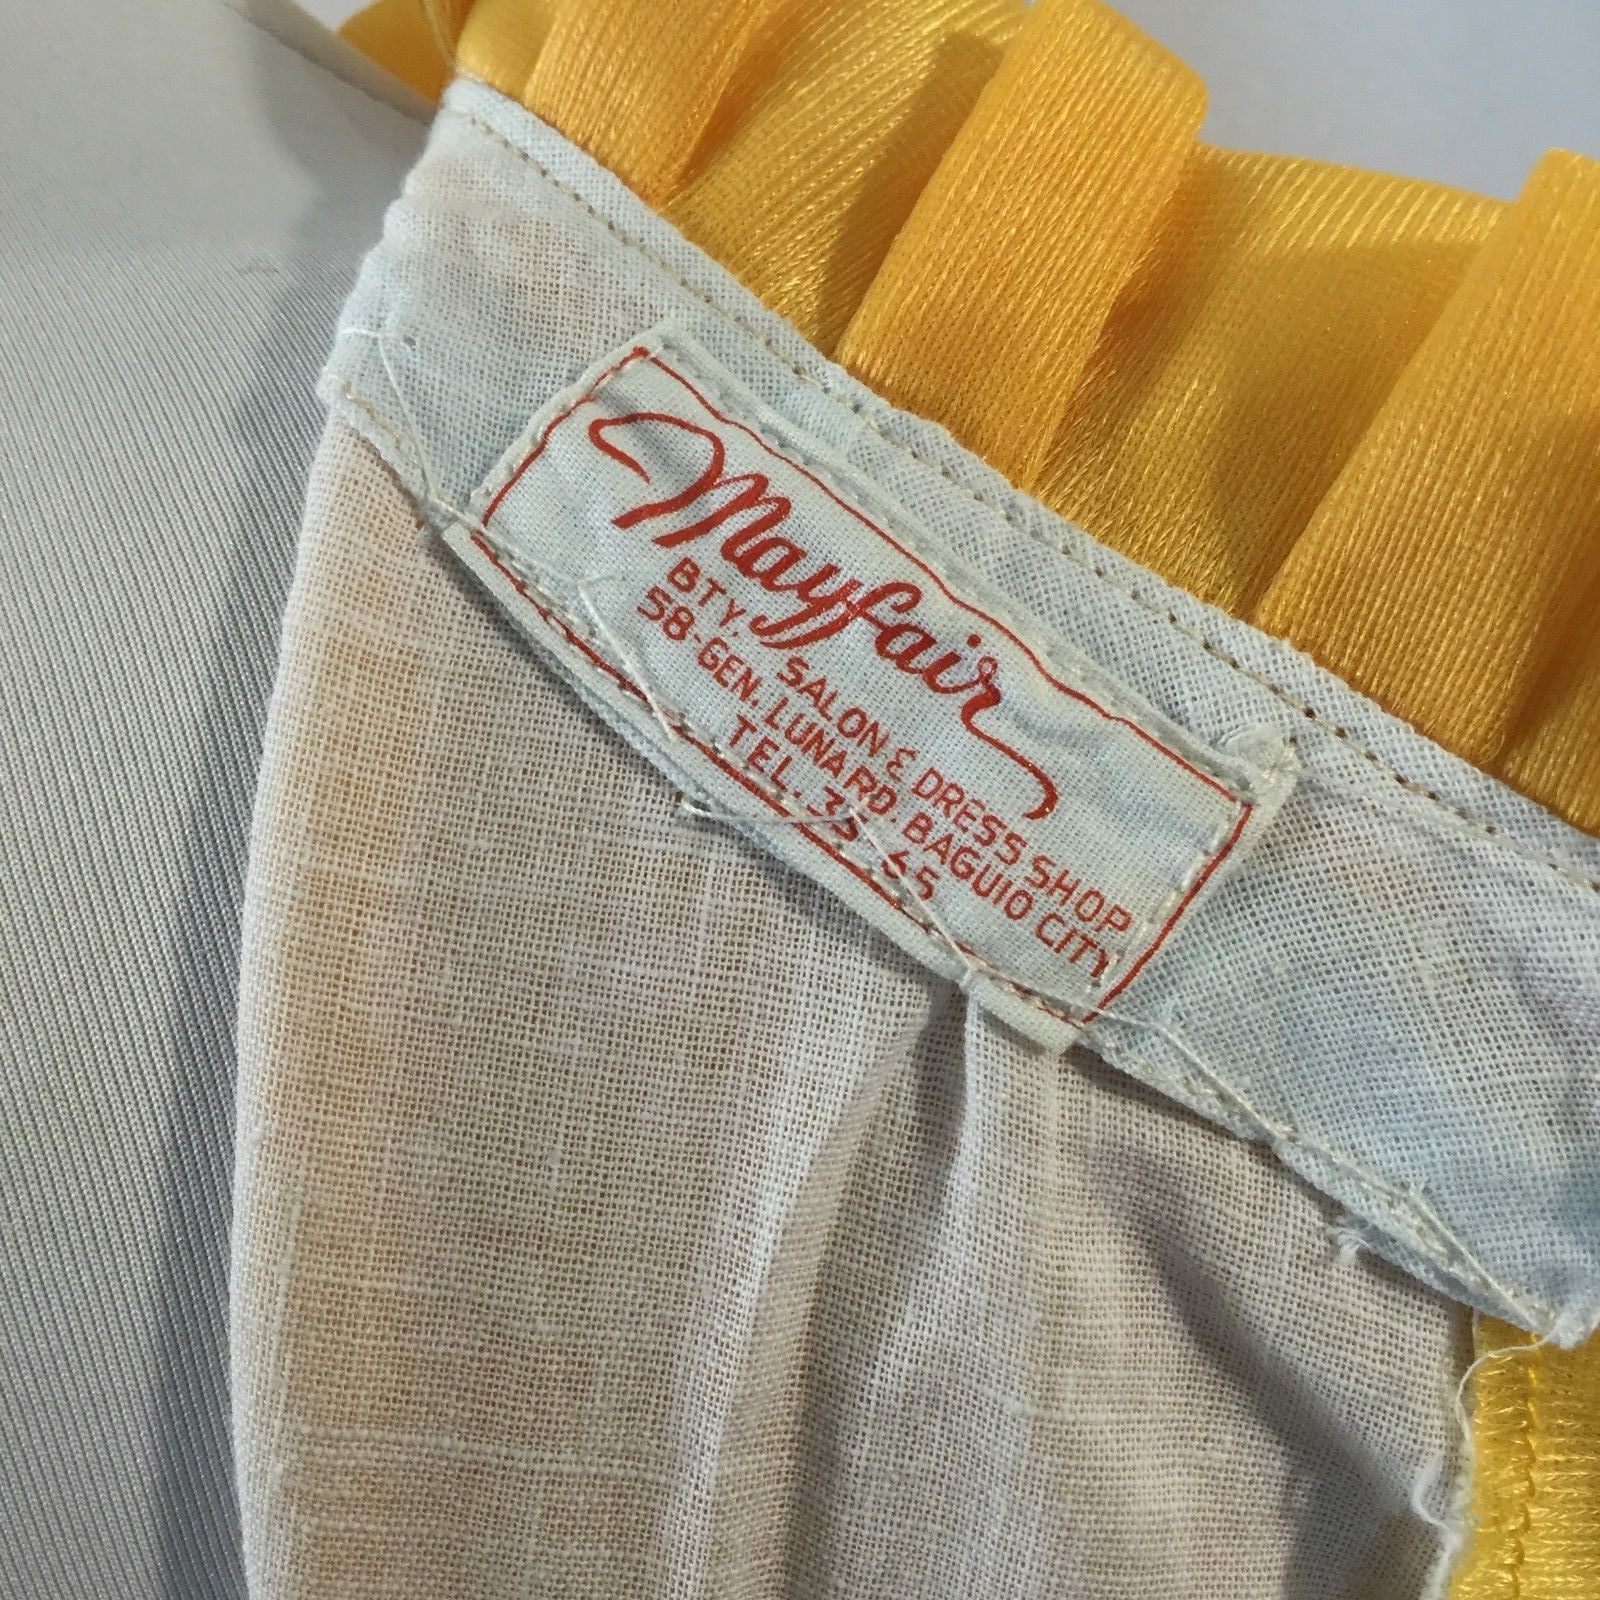 Vtg Groovy Mod Maxi Dress Autumn Fall Yellow Brown Black Medium Metal Zipper